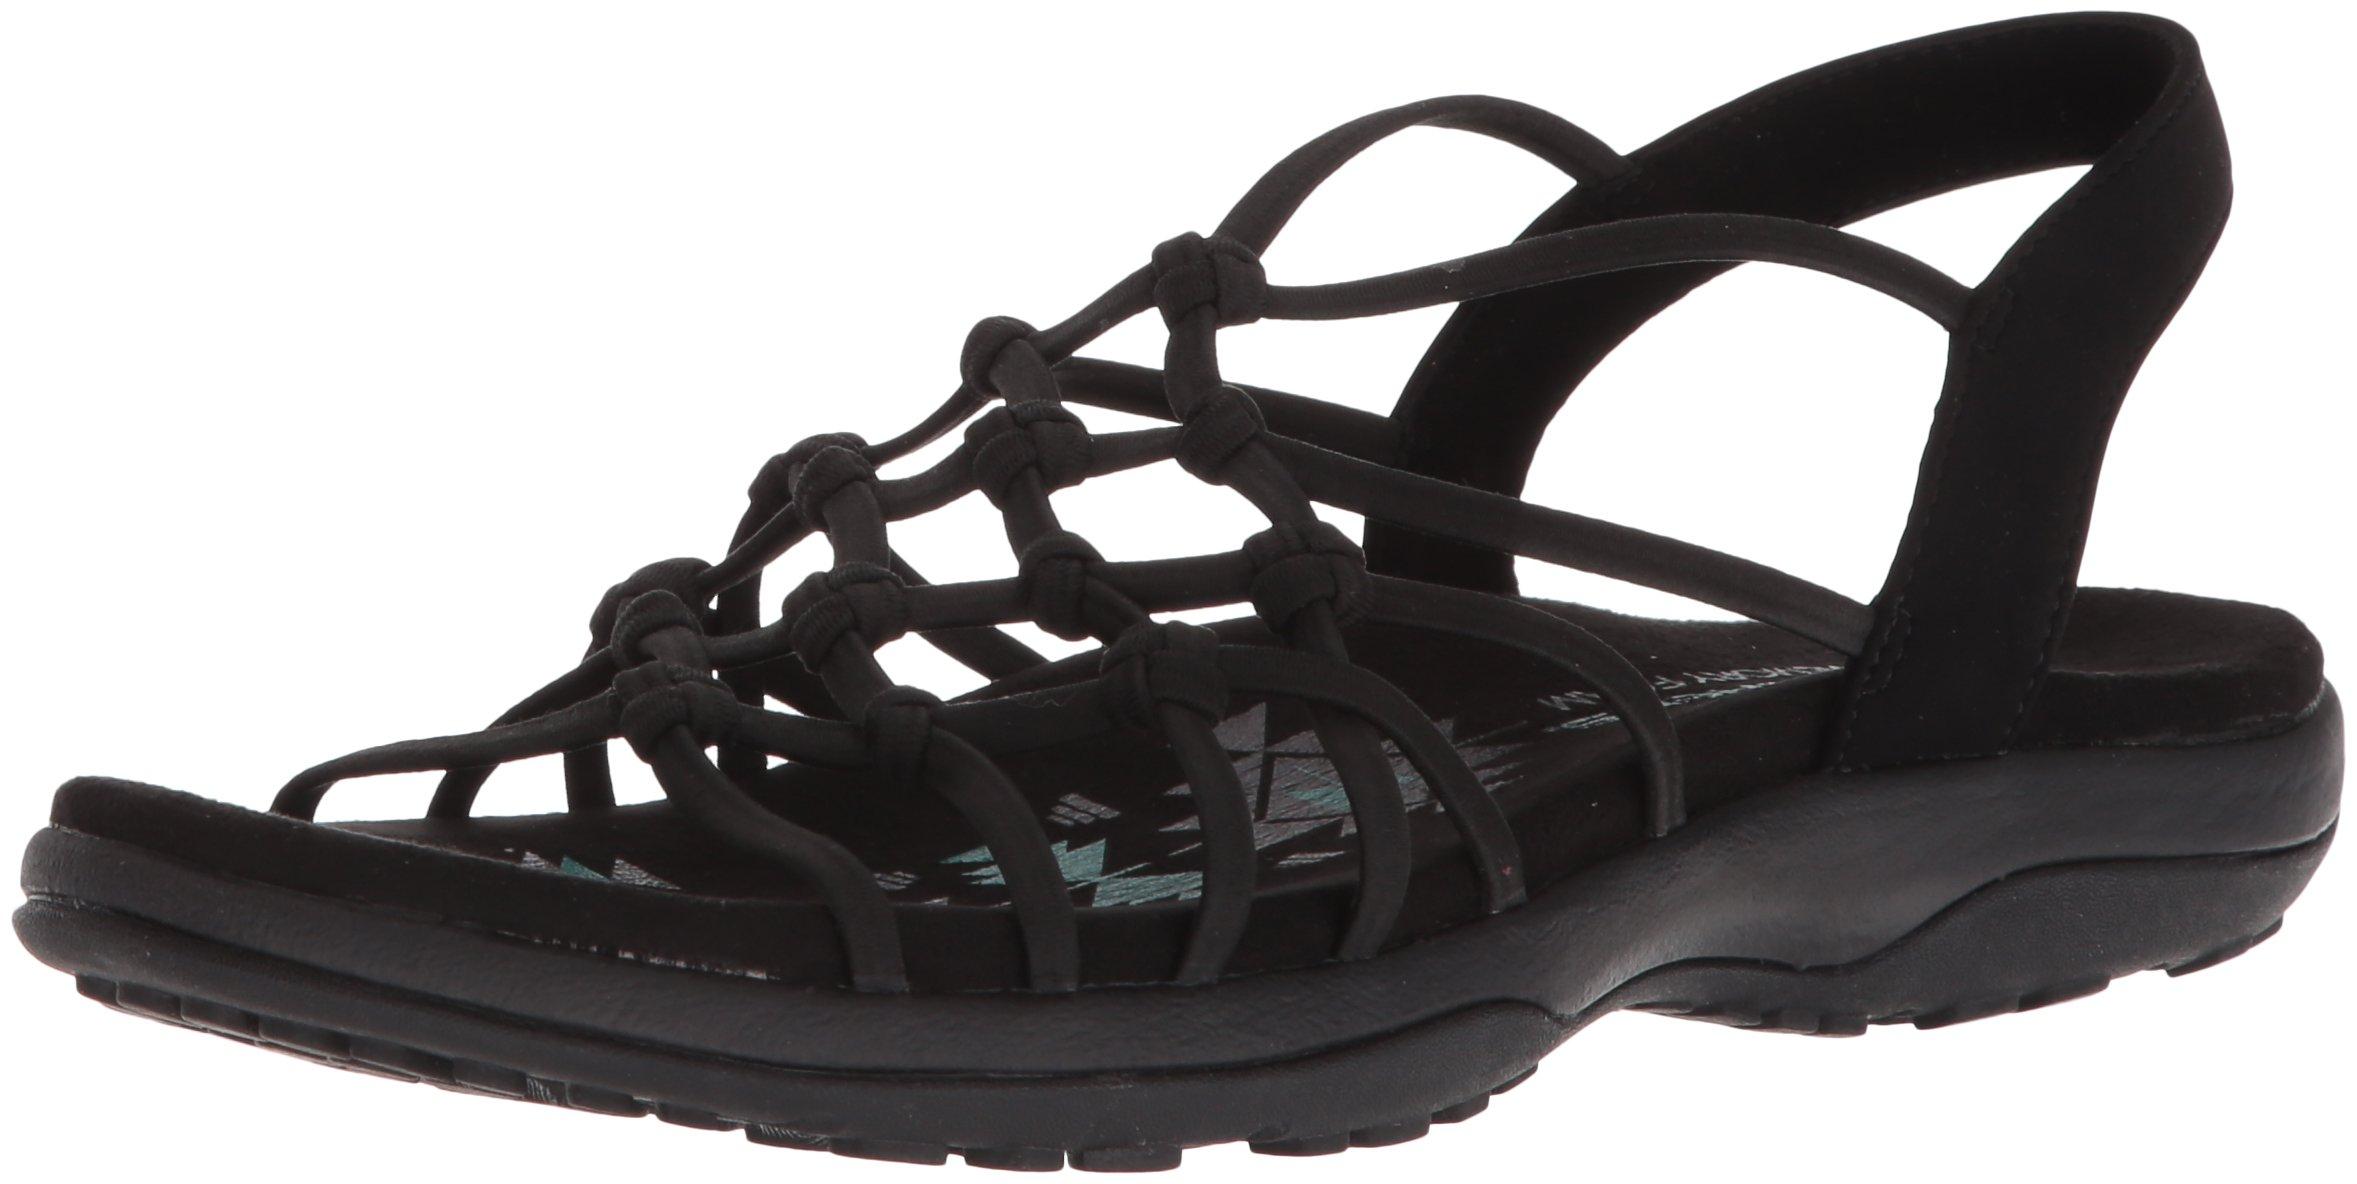 Skechers Women's Reggae Slim-Forget Knotted Web Gore Open Toe Slingback Sandal, Black, 7 W US